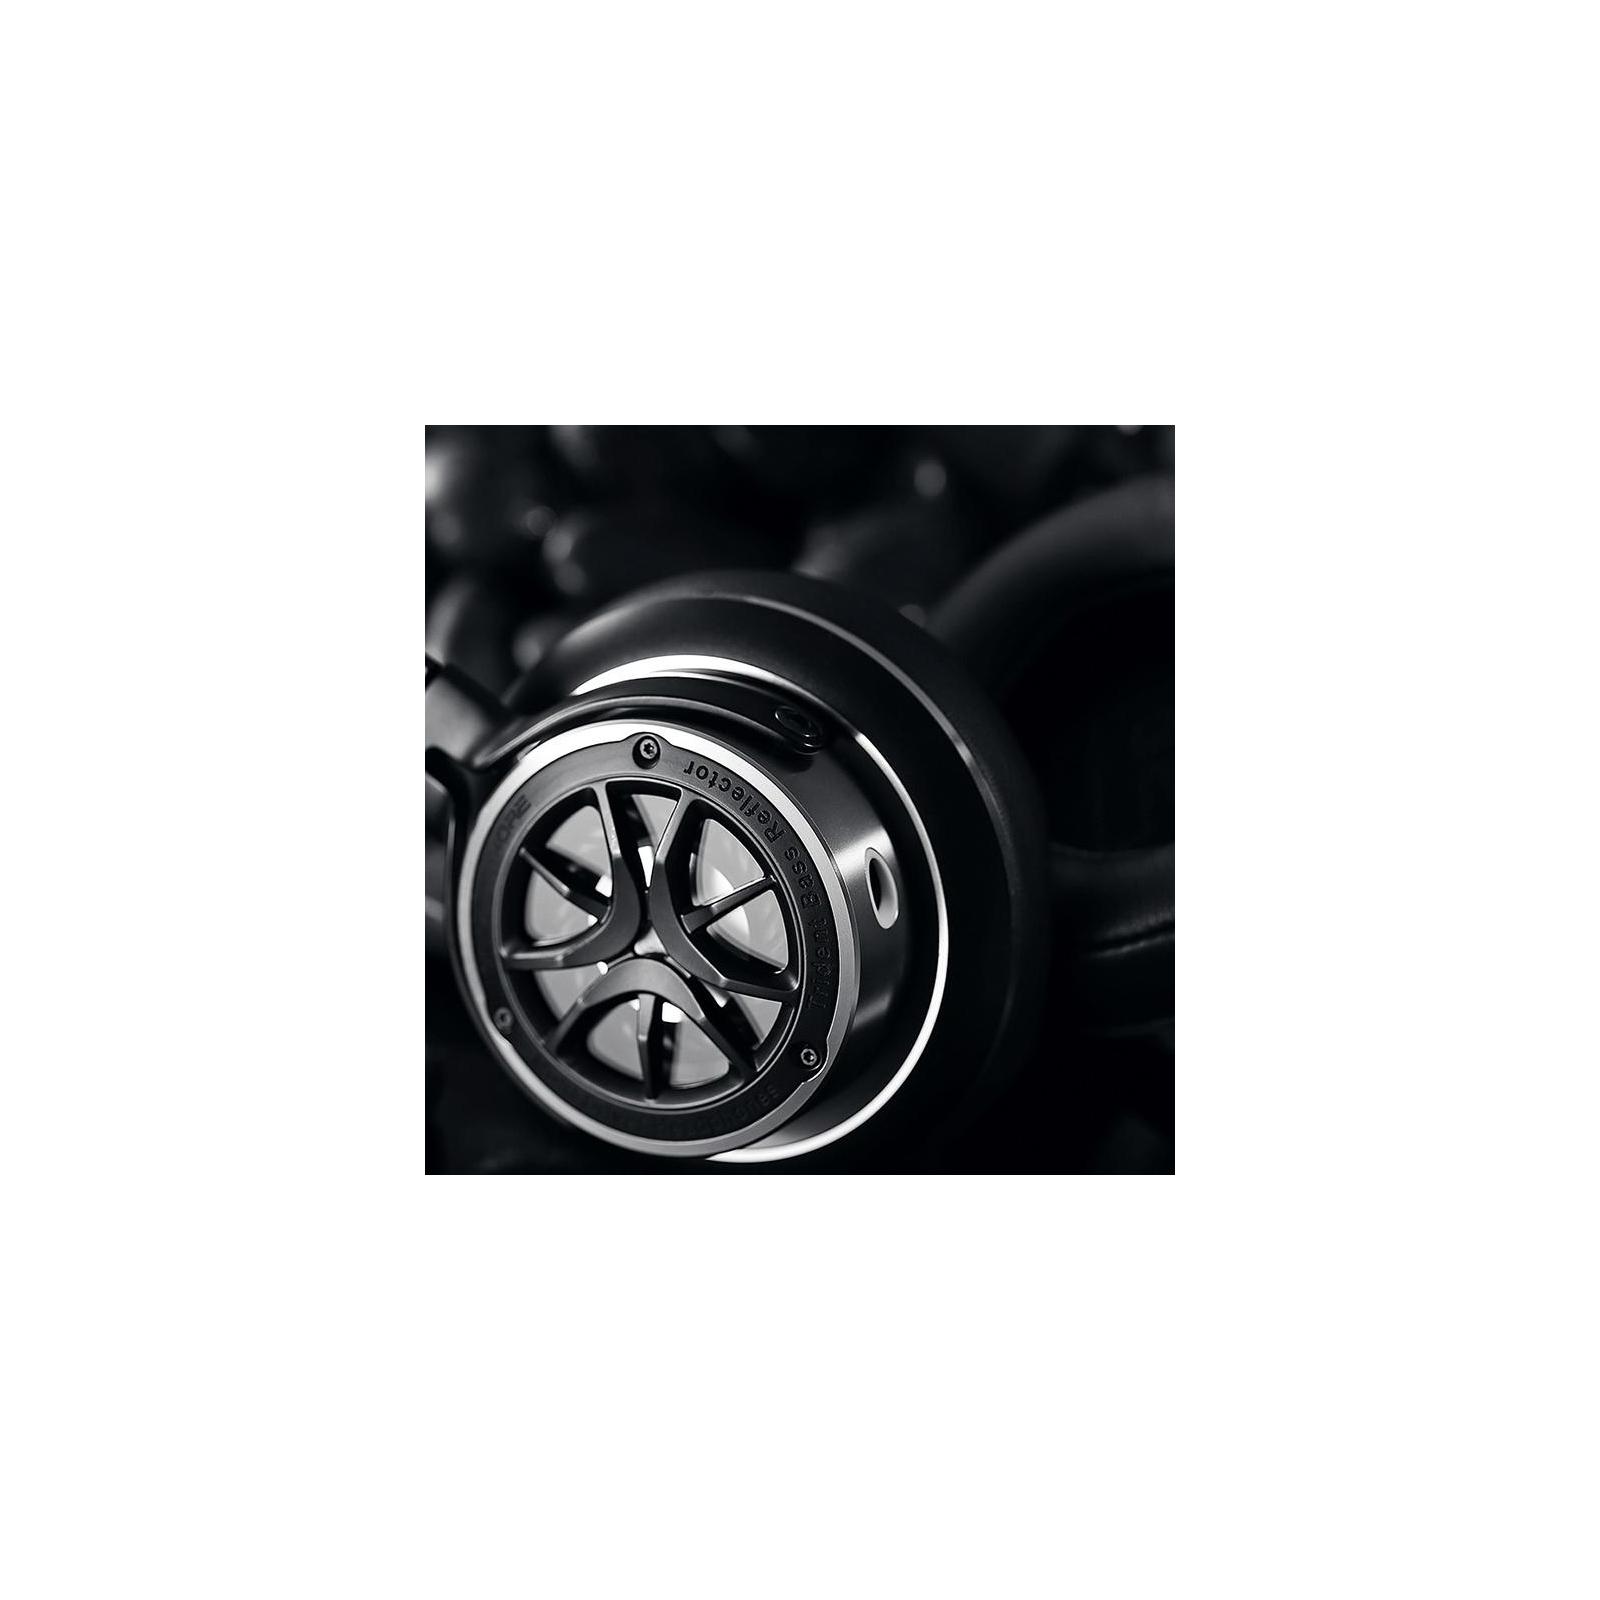 Наушники 1MORE Ceramic Triple Driver Over Head Silver (H1707 Silver) изображение 9